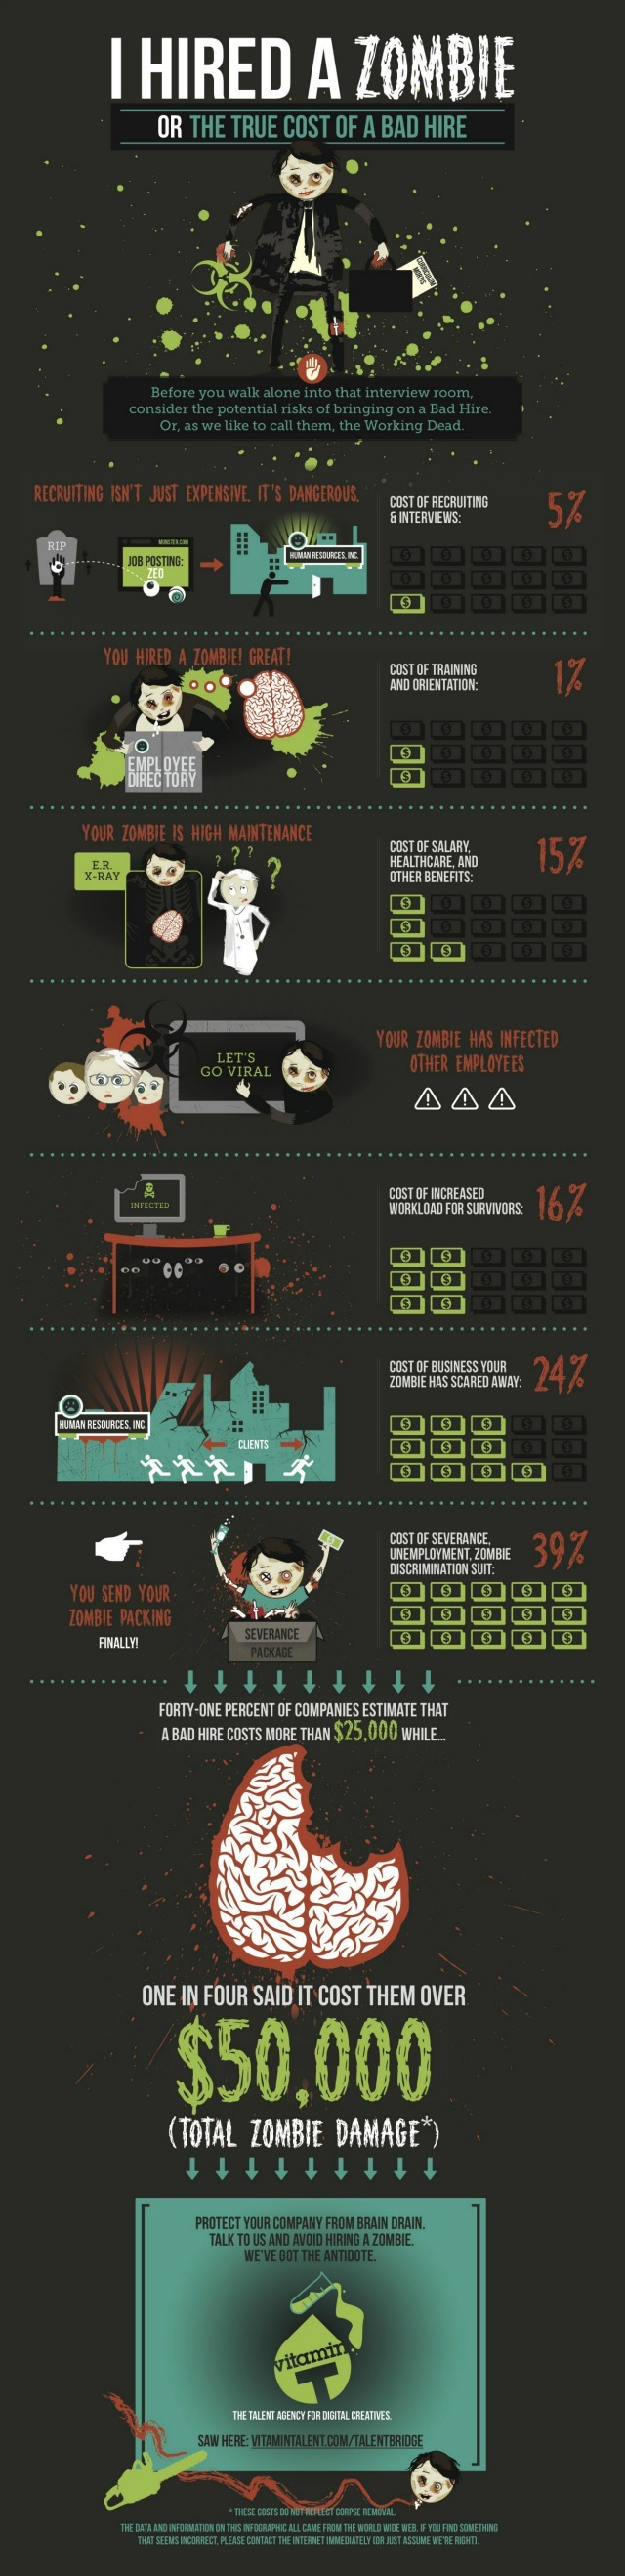 infographie_mauvais_recrutement